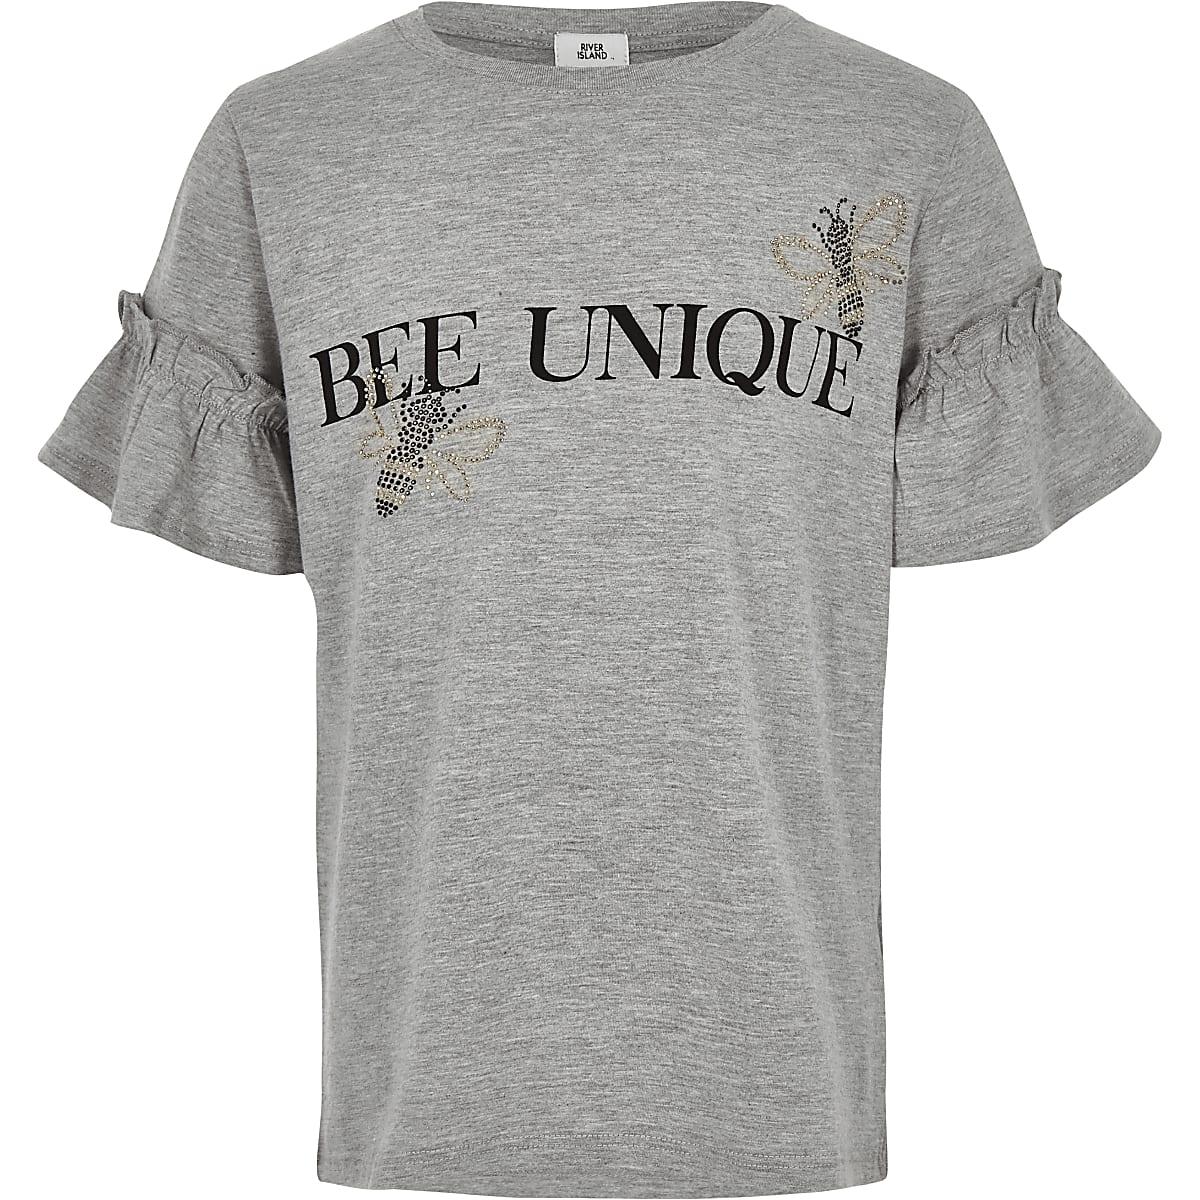 Girls grey 'Bee unique' T-shirt